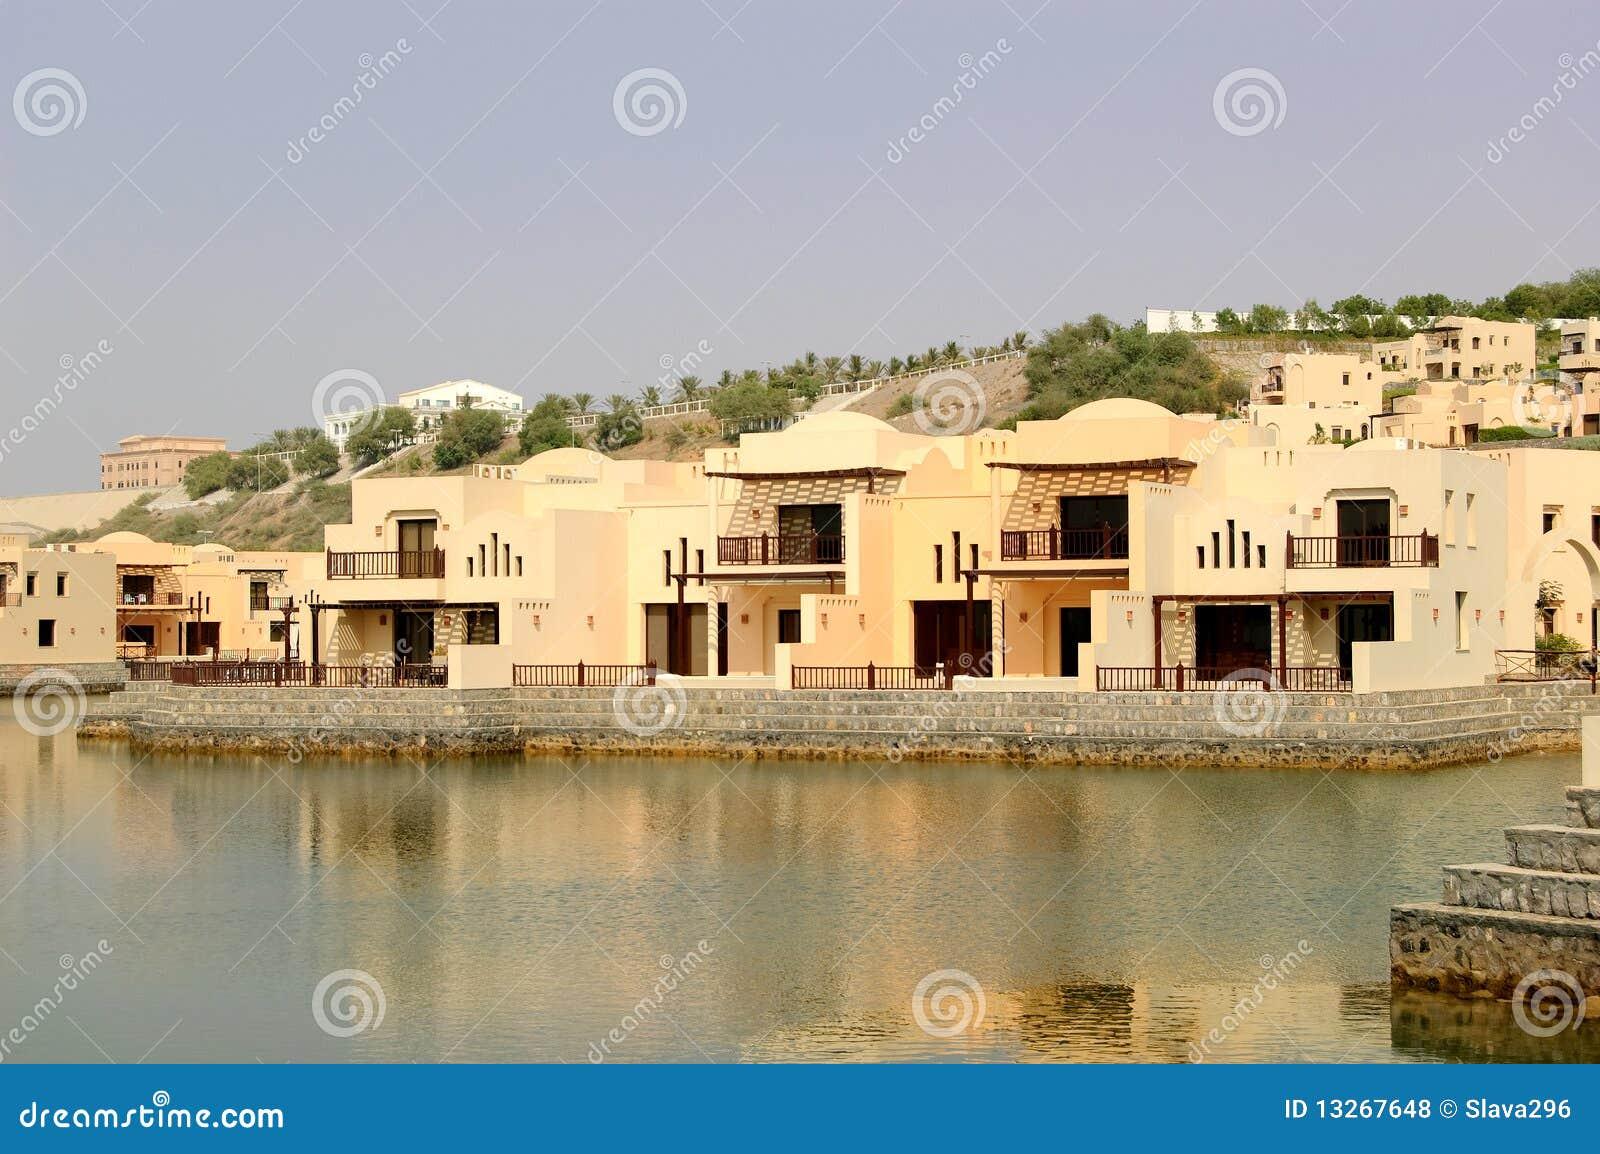 Casas de campo no hotel de luxo dubai uae fotos de stock for No 1 hotel in dubai